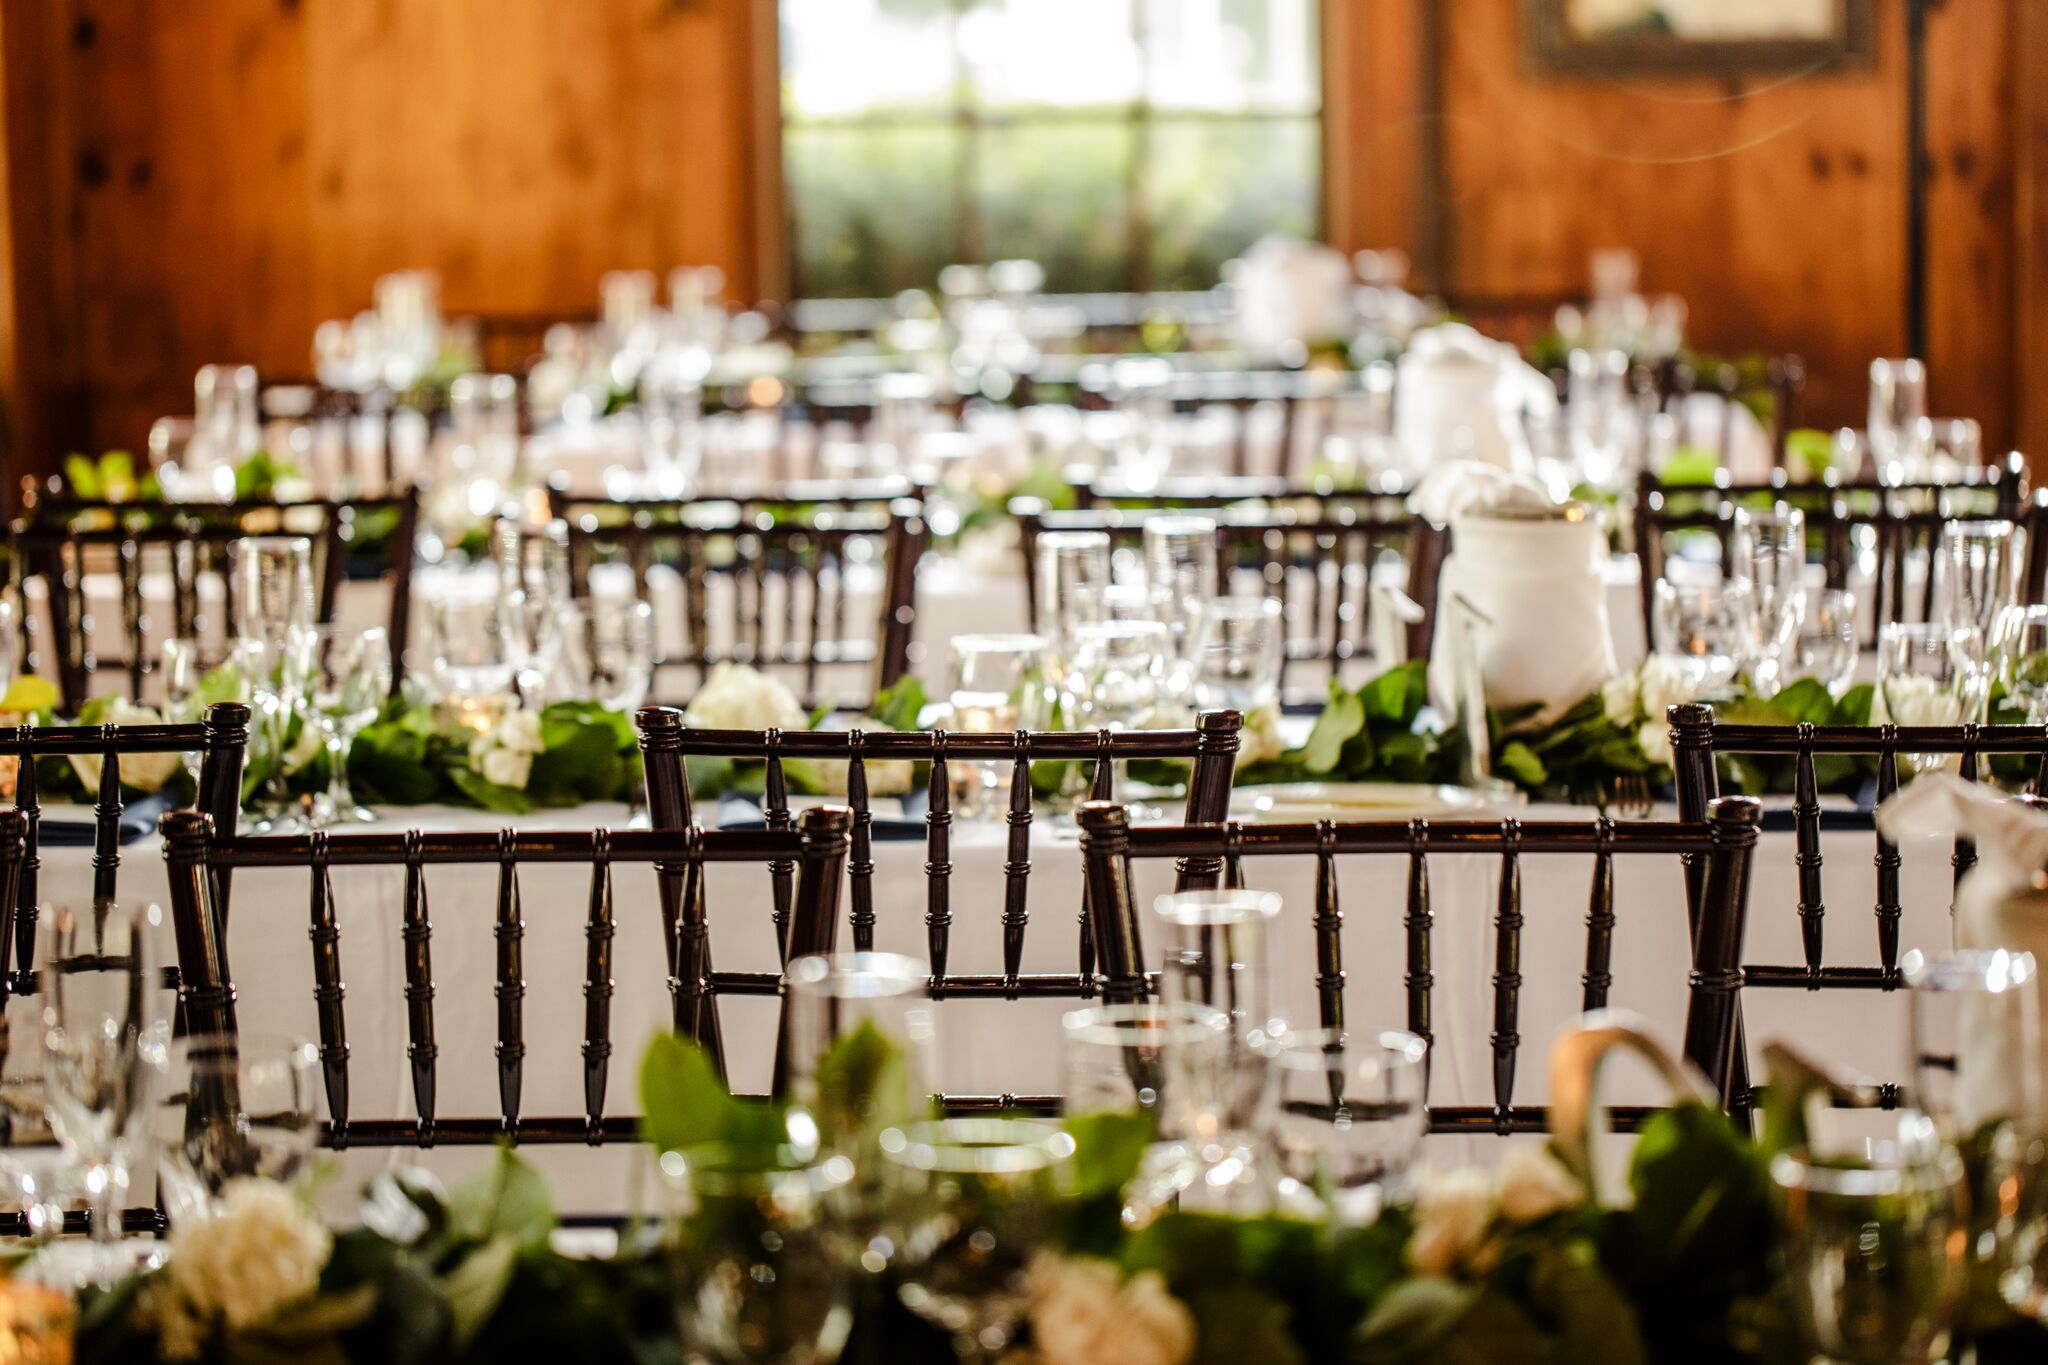 Wedding Reception Ideas At Wellers Carriage House Saline Michigan Michigan Wedding Venues Ann Arbor Wedding Venues Chiavari Chairs Wedding